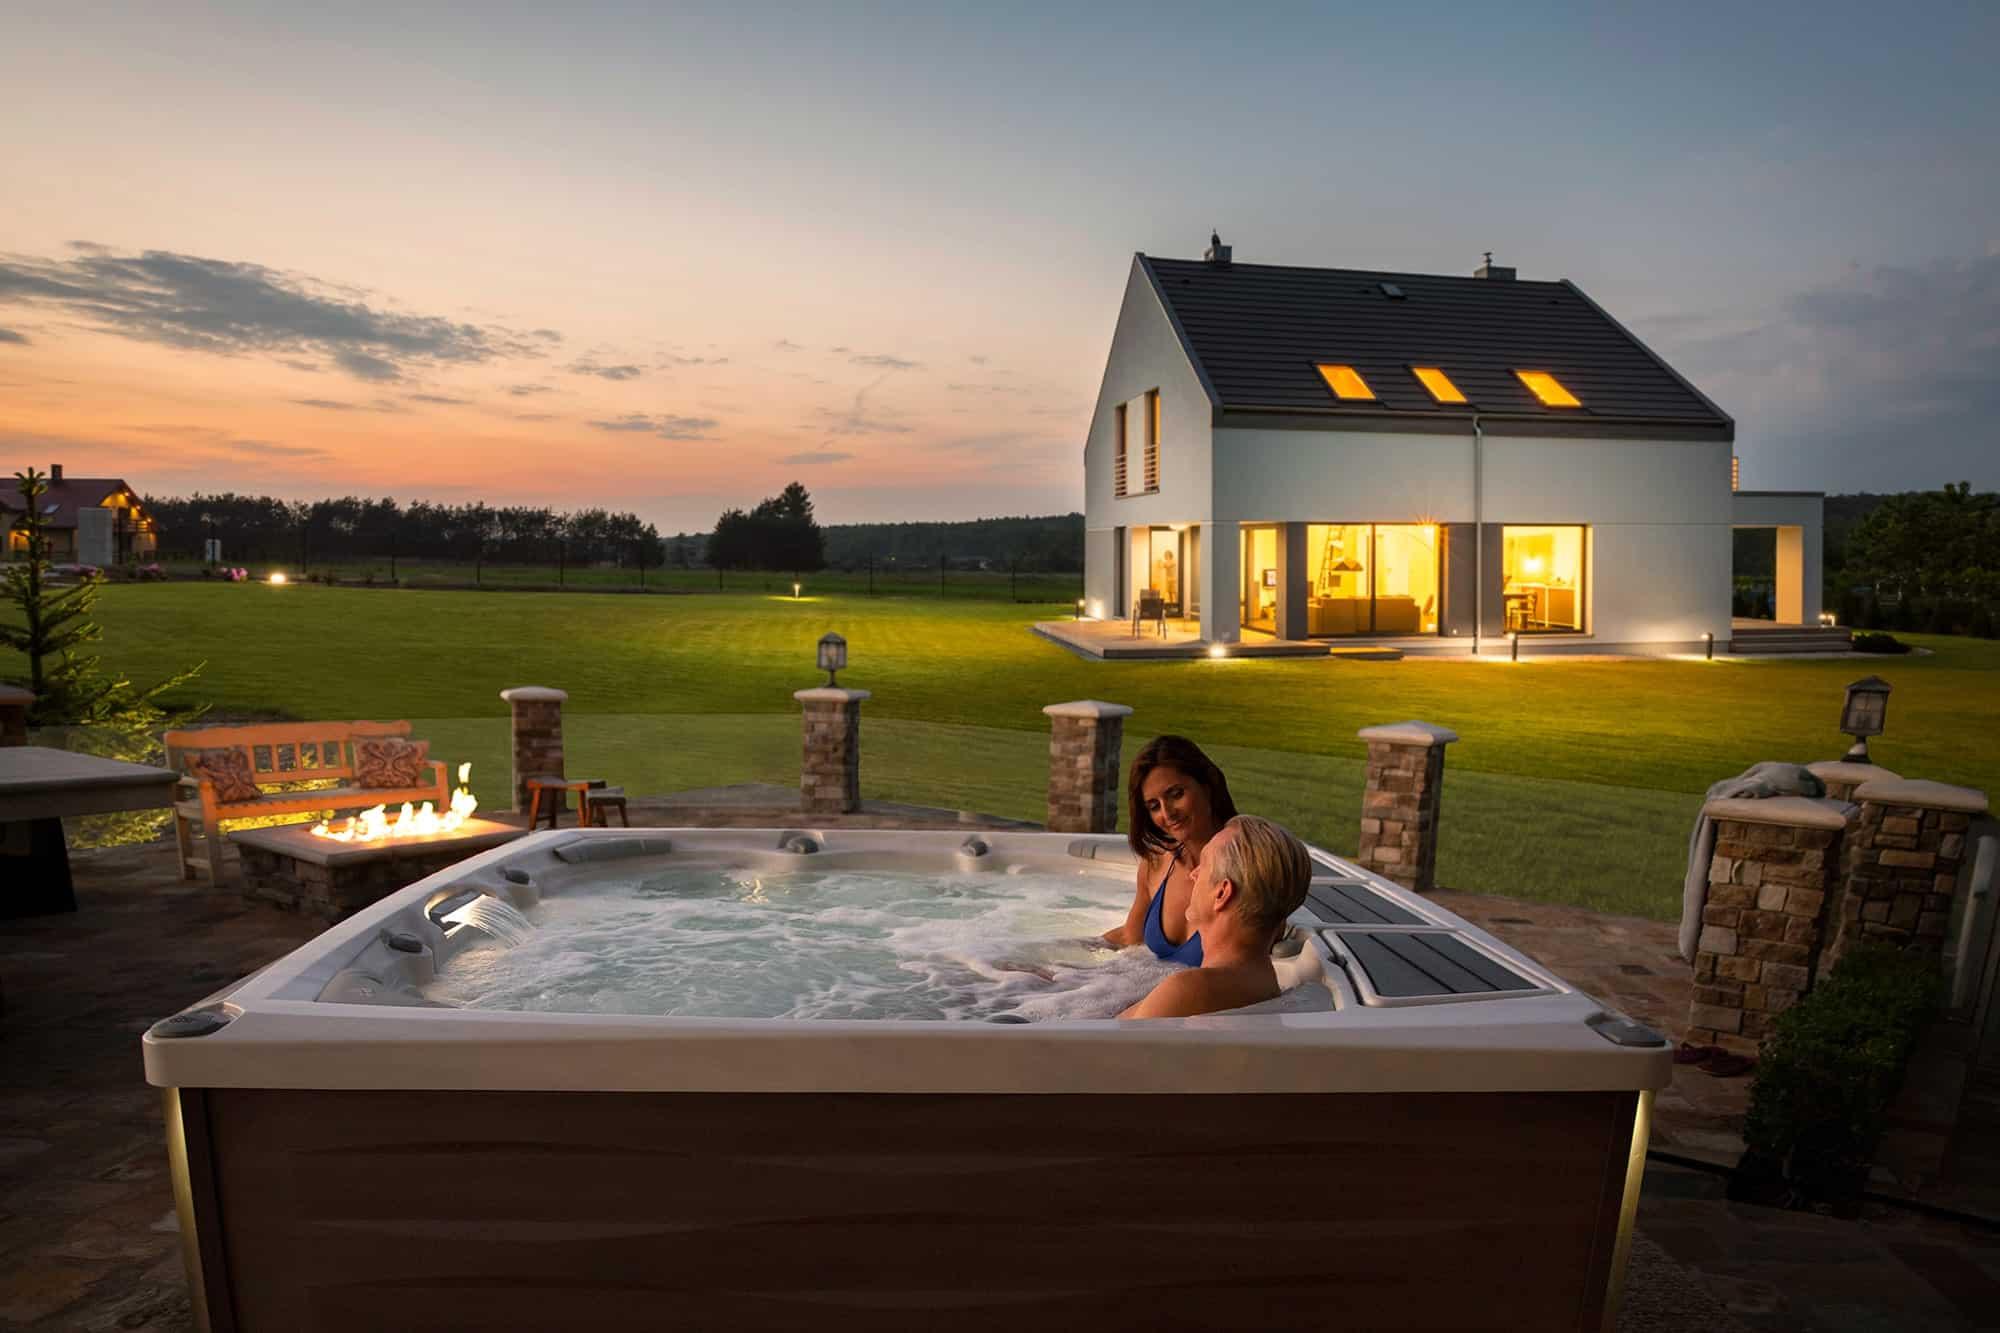 Couple enjoying their Sundance Spas hot tub at sunset